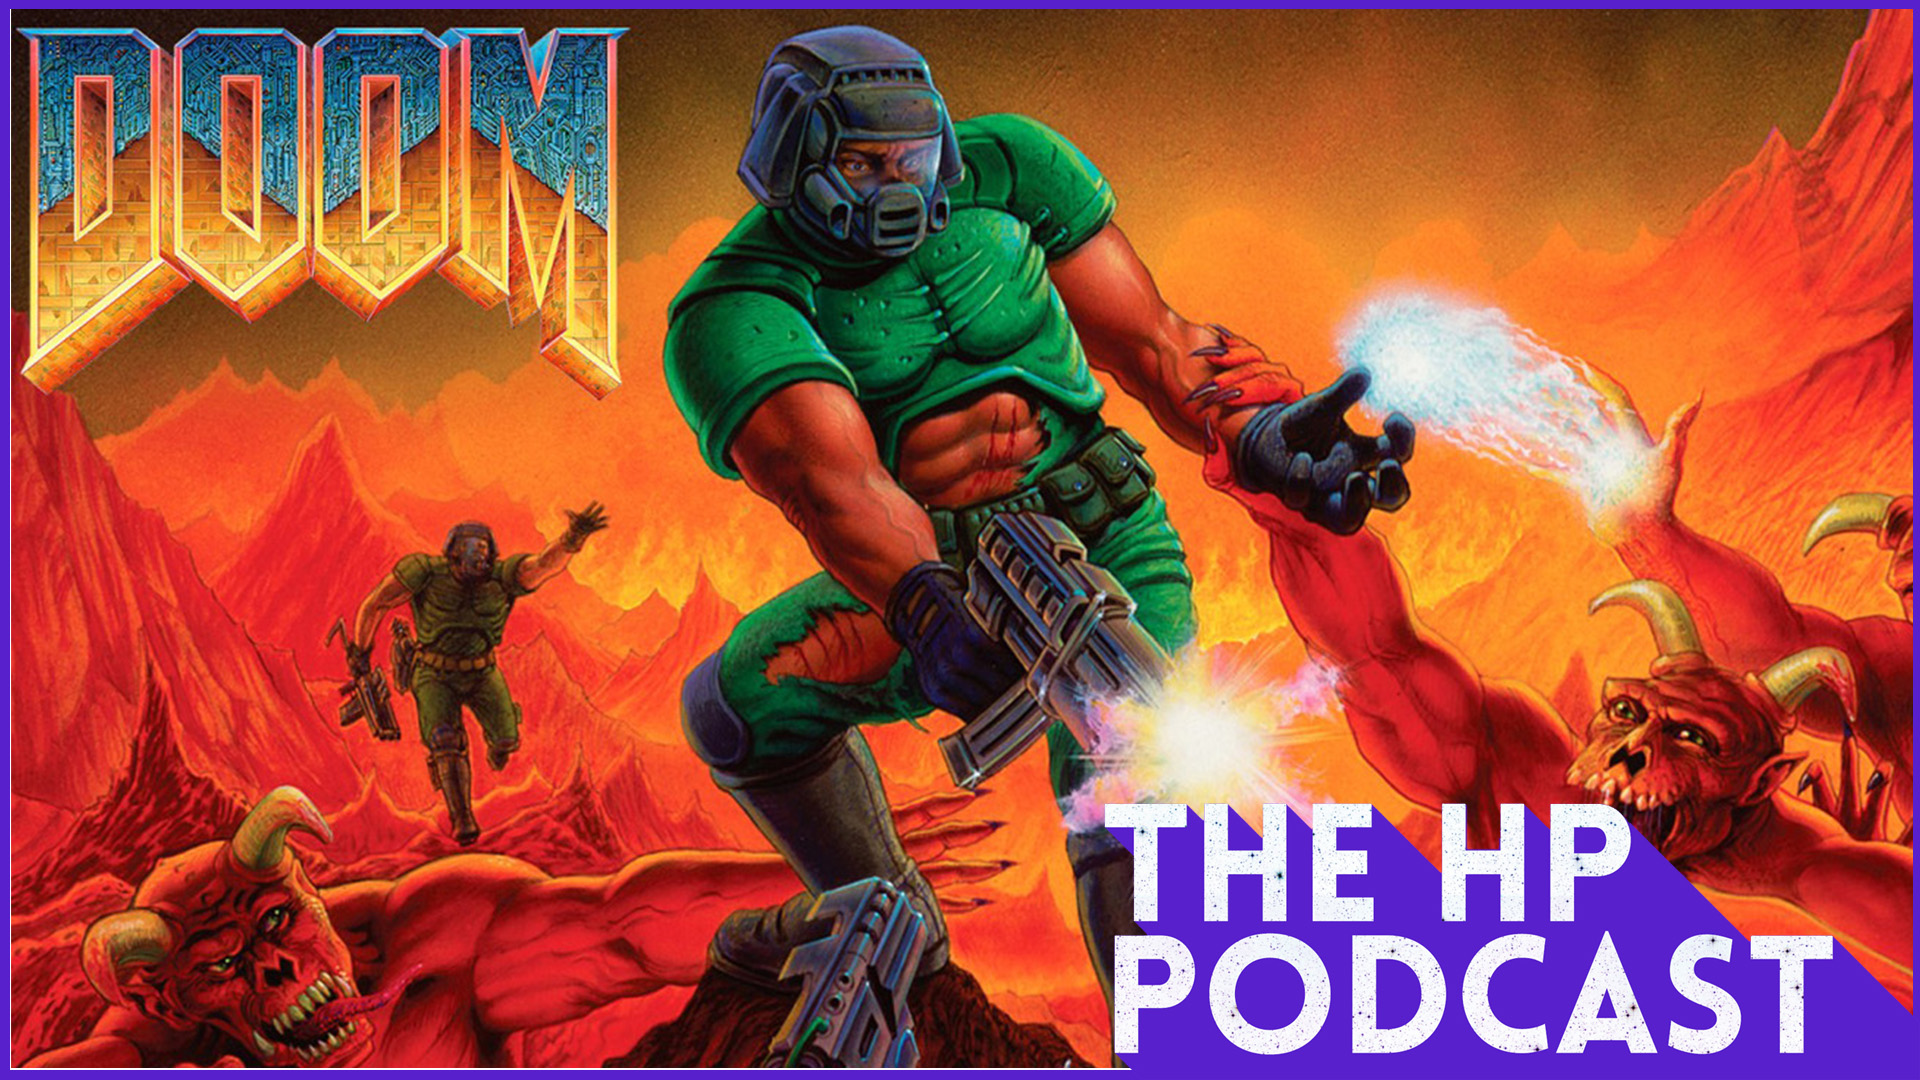 Classic DOOM is back! - The HP Podcast #29 | Handsome Phantom